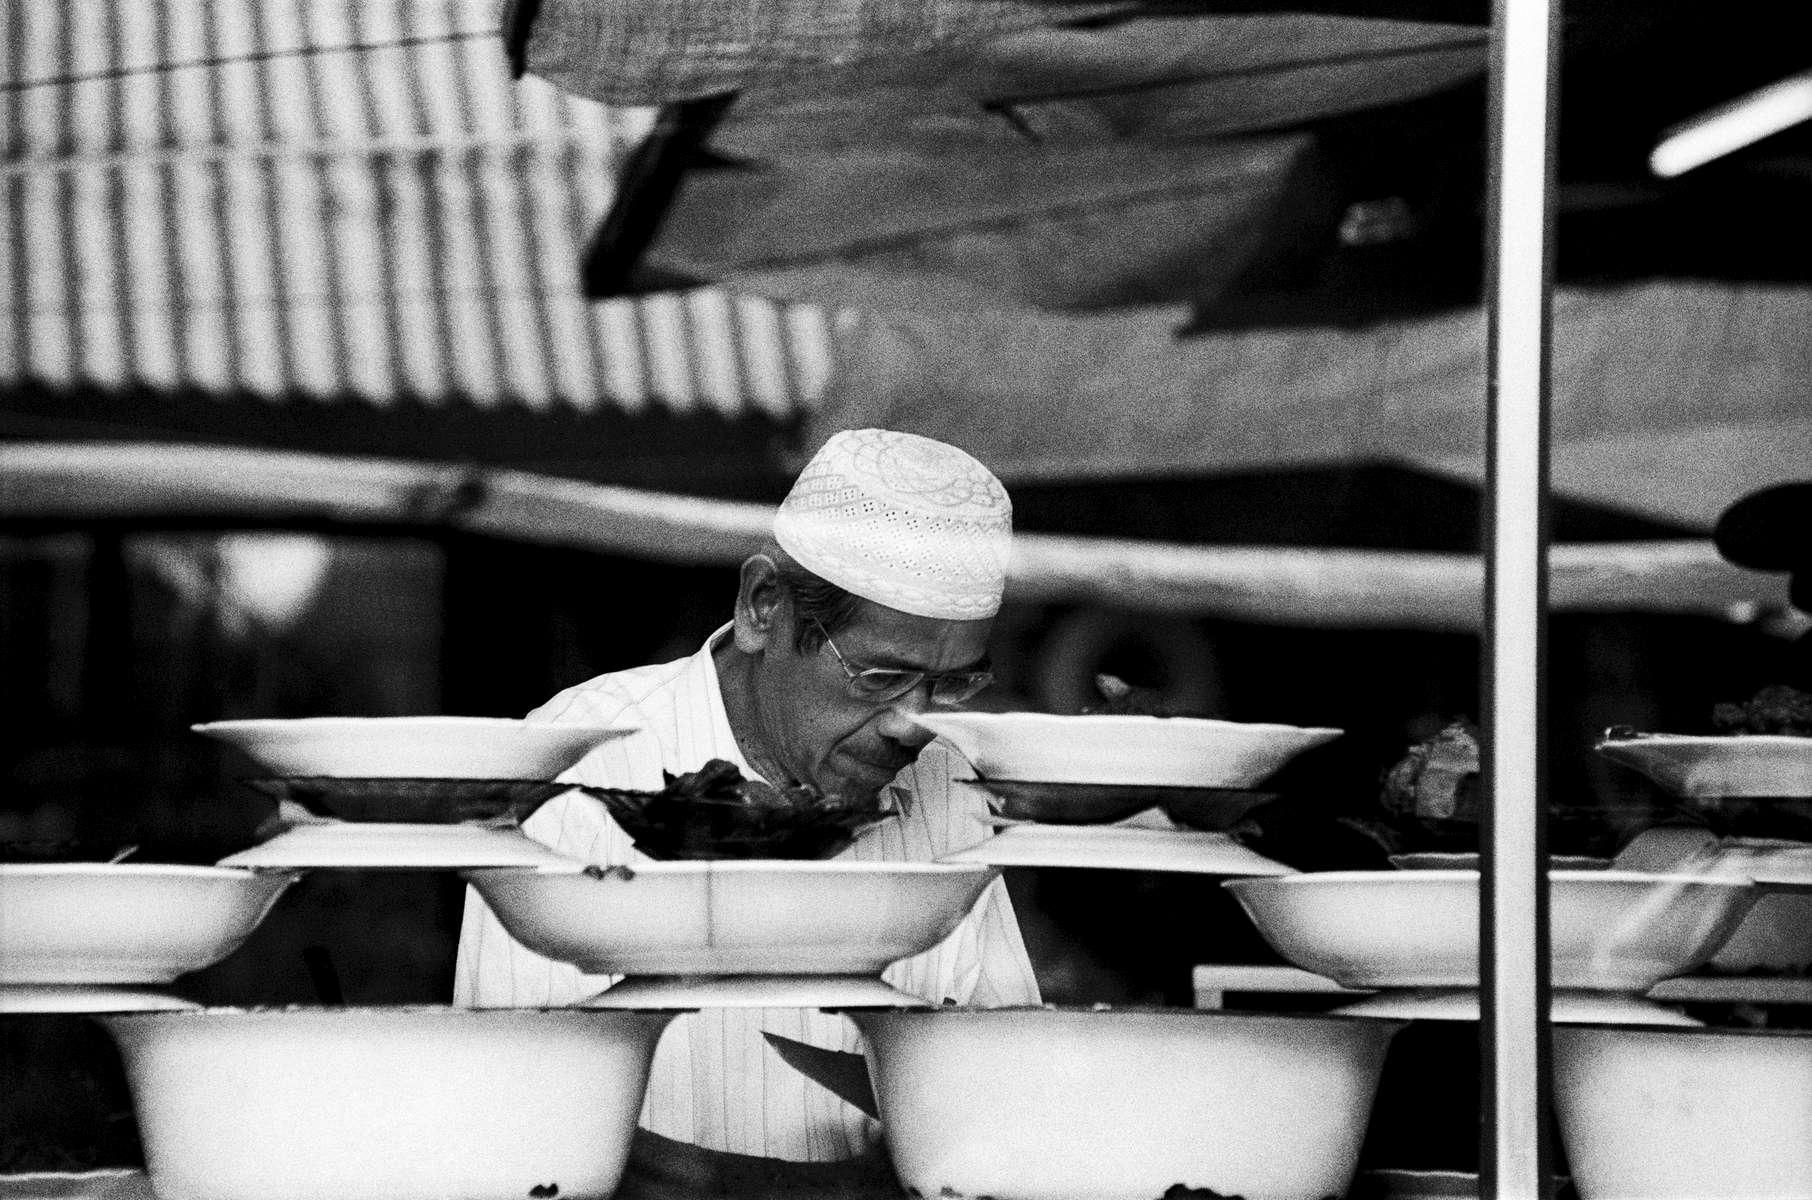 Padang restaurant owner, Sumatra 2003